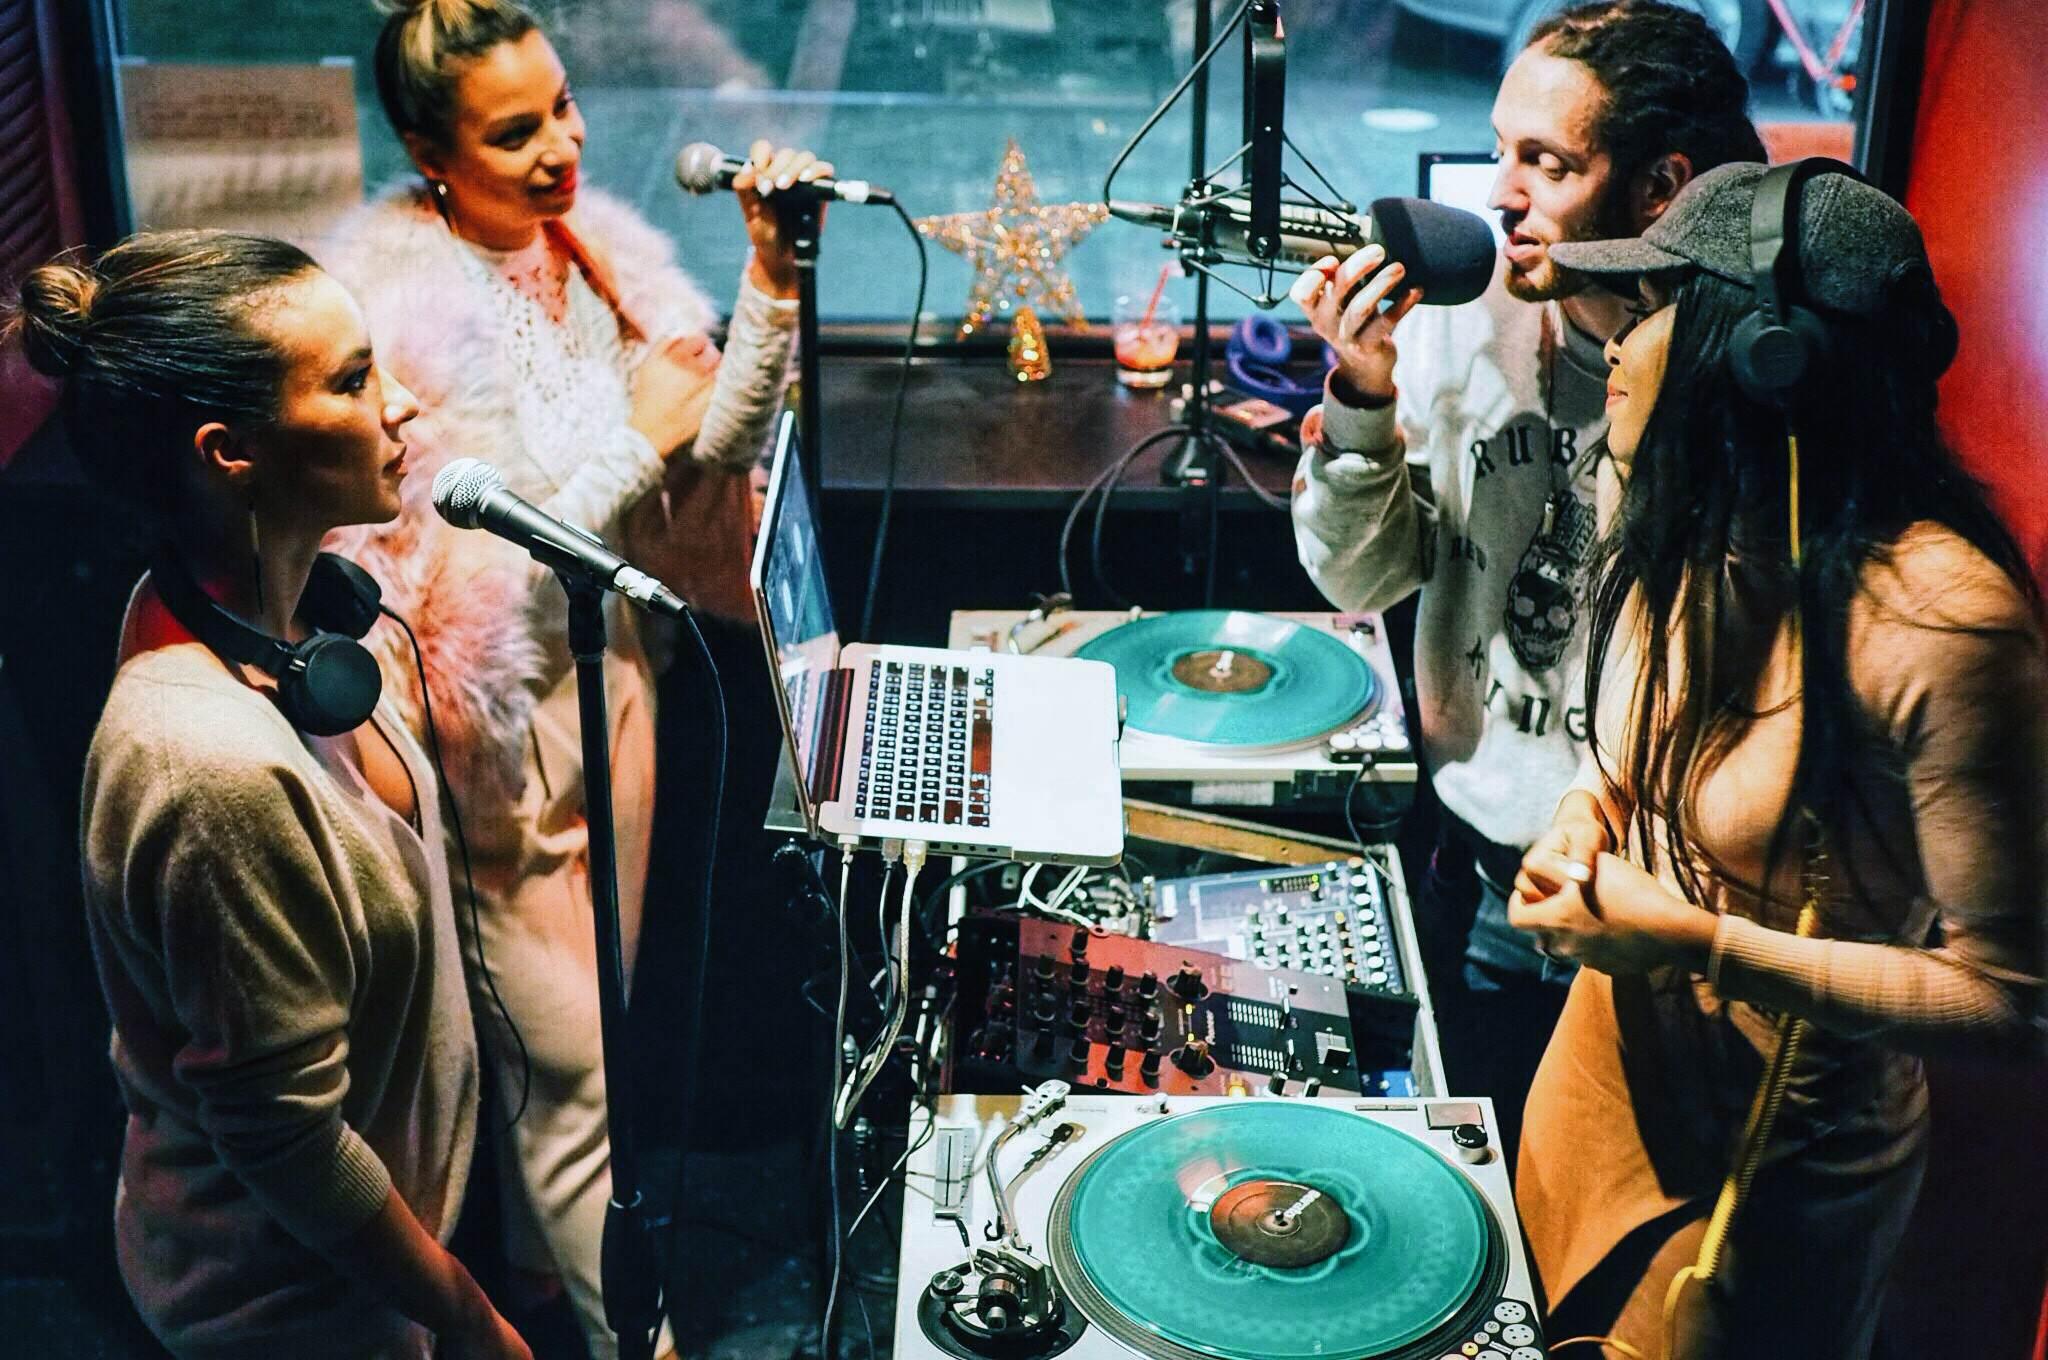 Kieran Meadows  interviewing  Ms. Nix ,  Jasmine Solano  and  Martina McFlyy  on  The REFRESH Radio Show . (Photo: Andre Power)